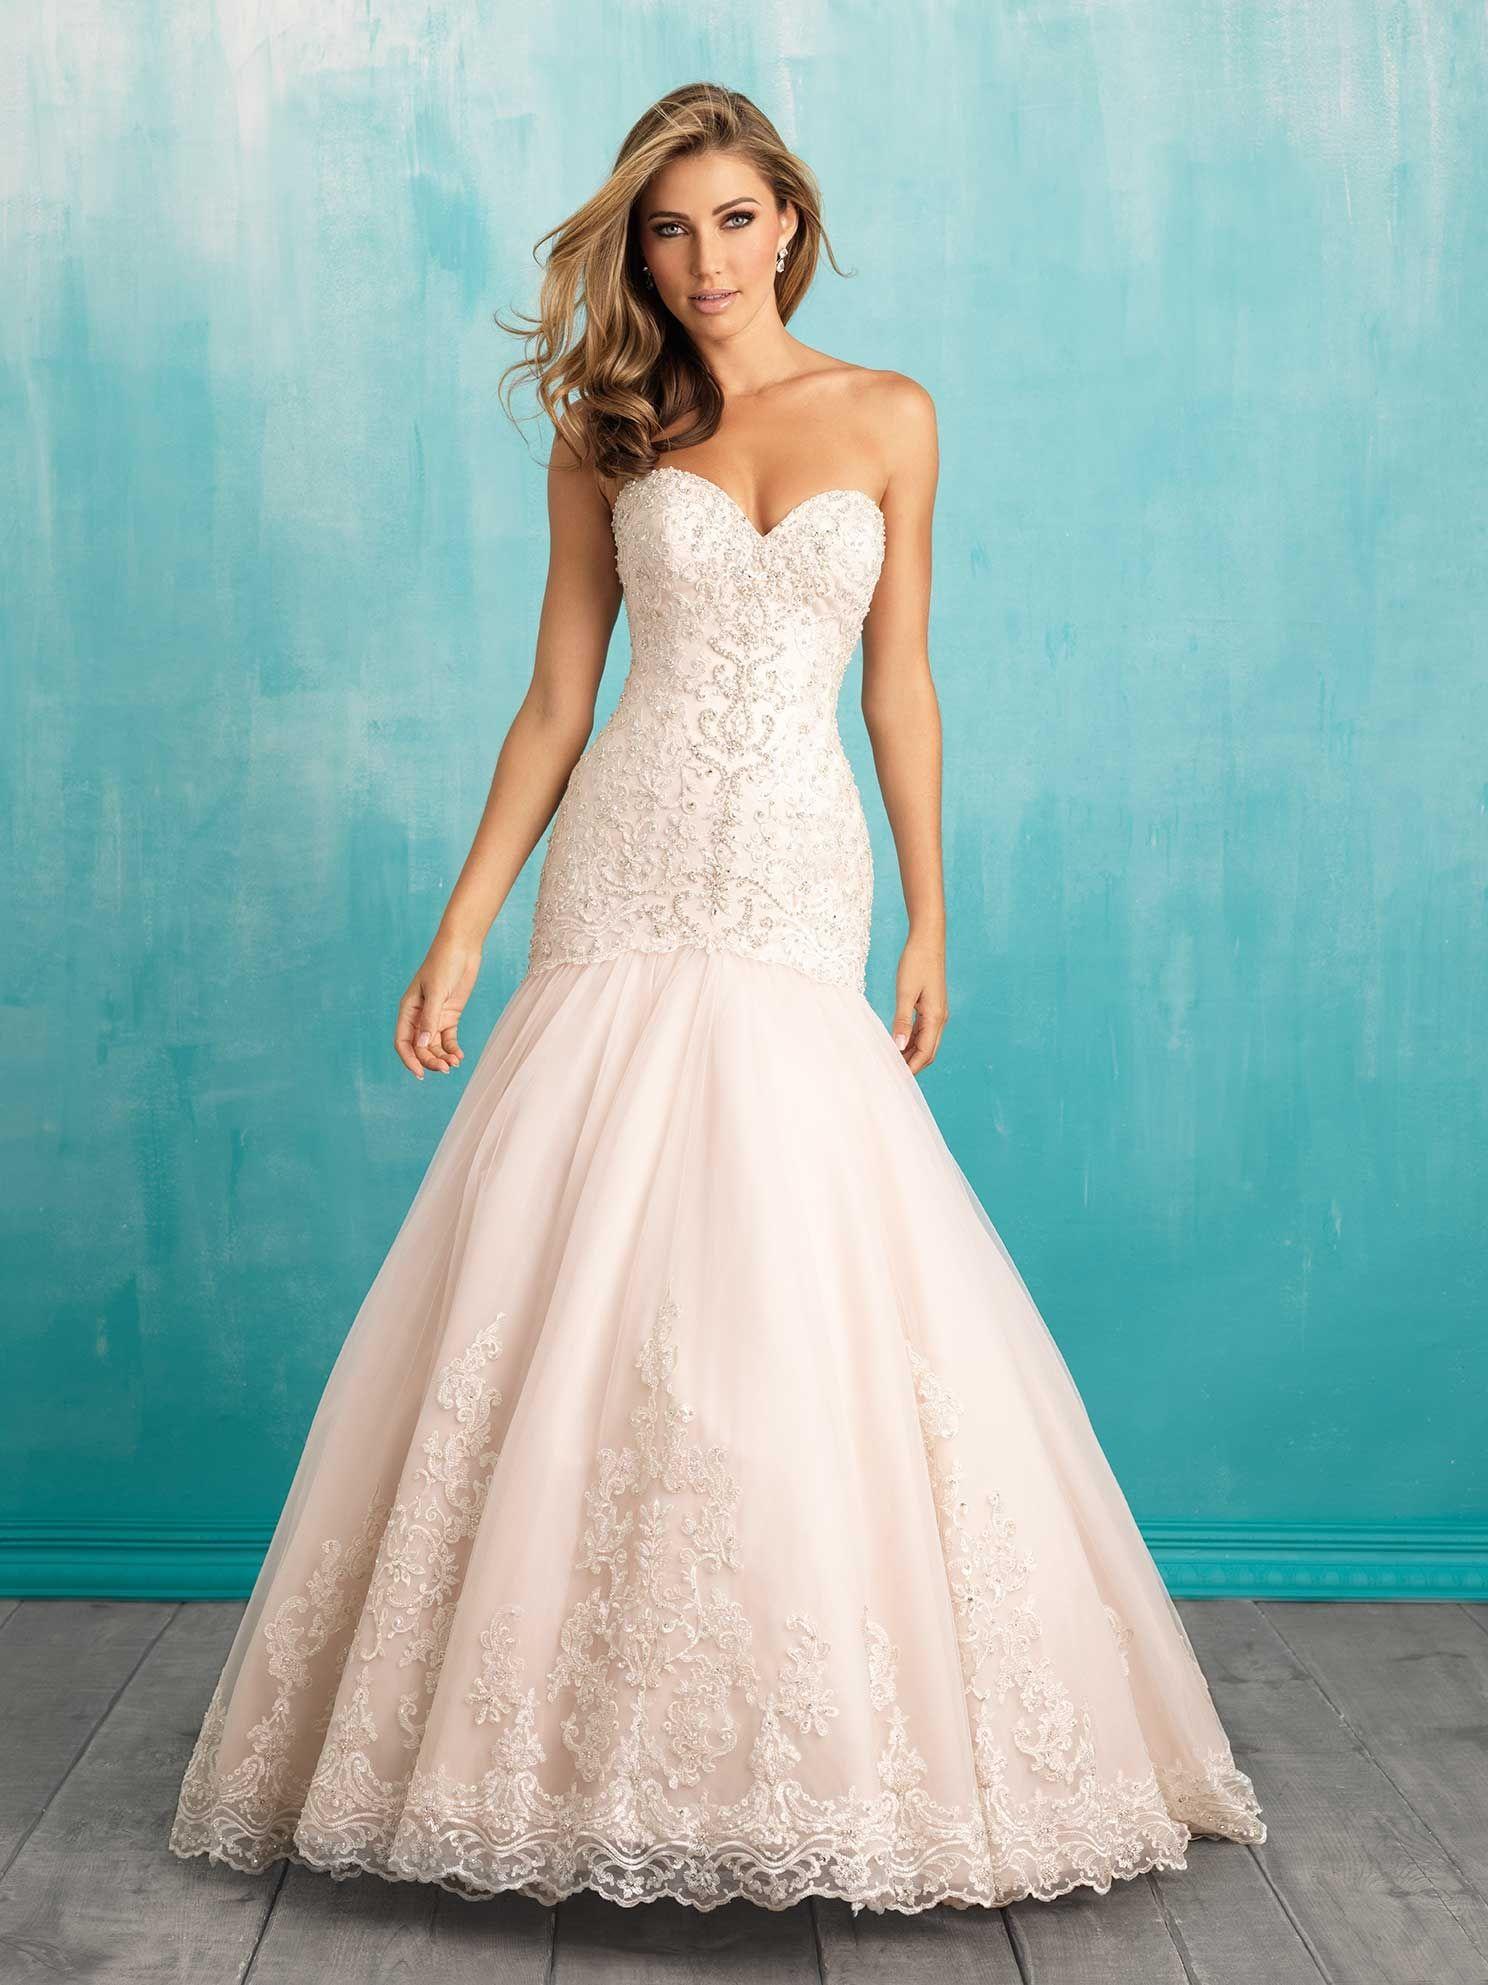 wedding dresses spokane wa - Wedding Decor Ideas